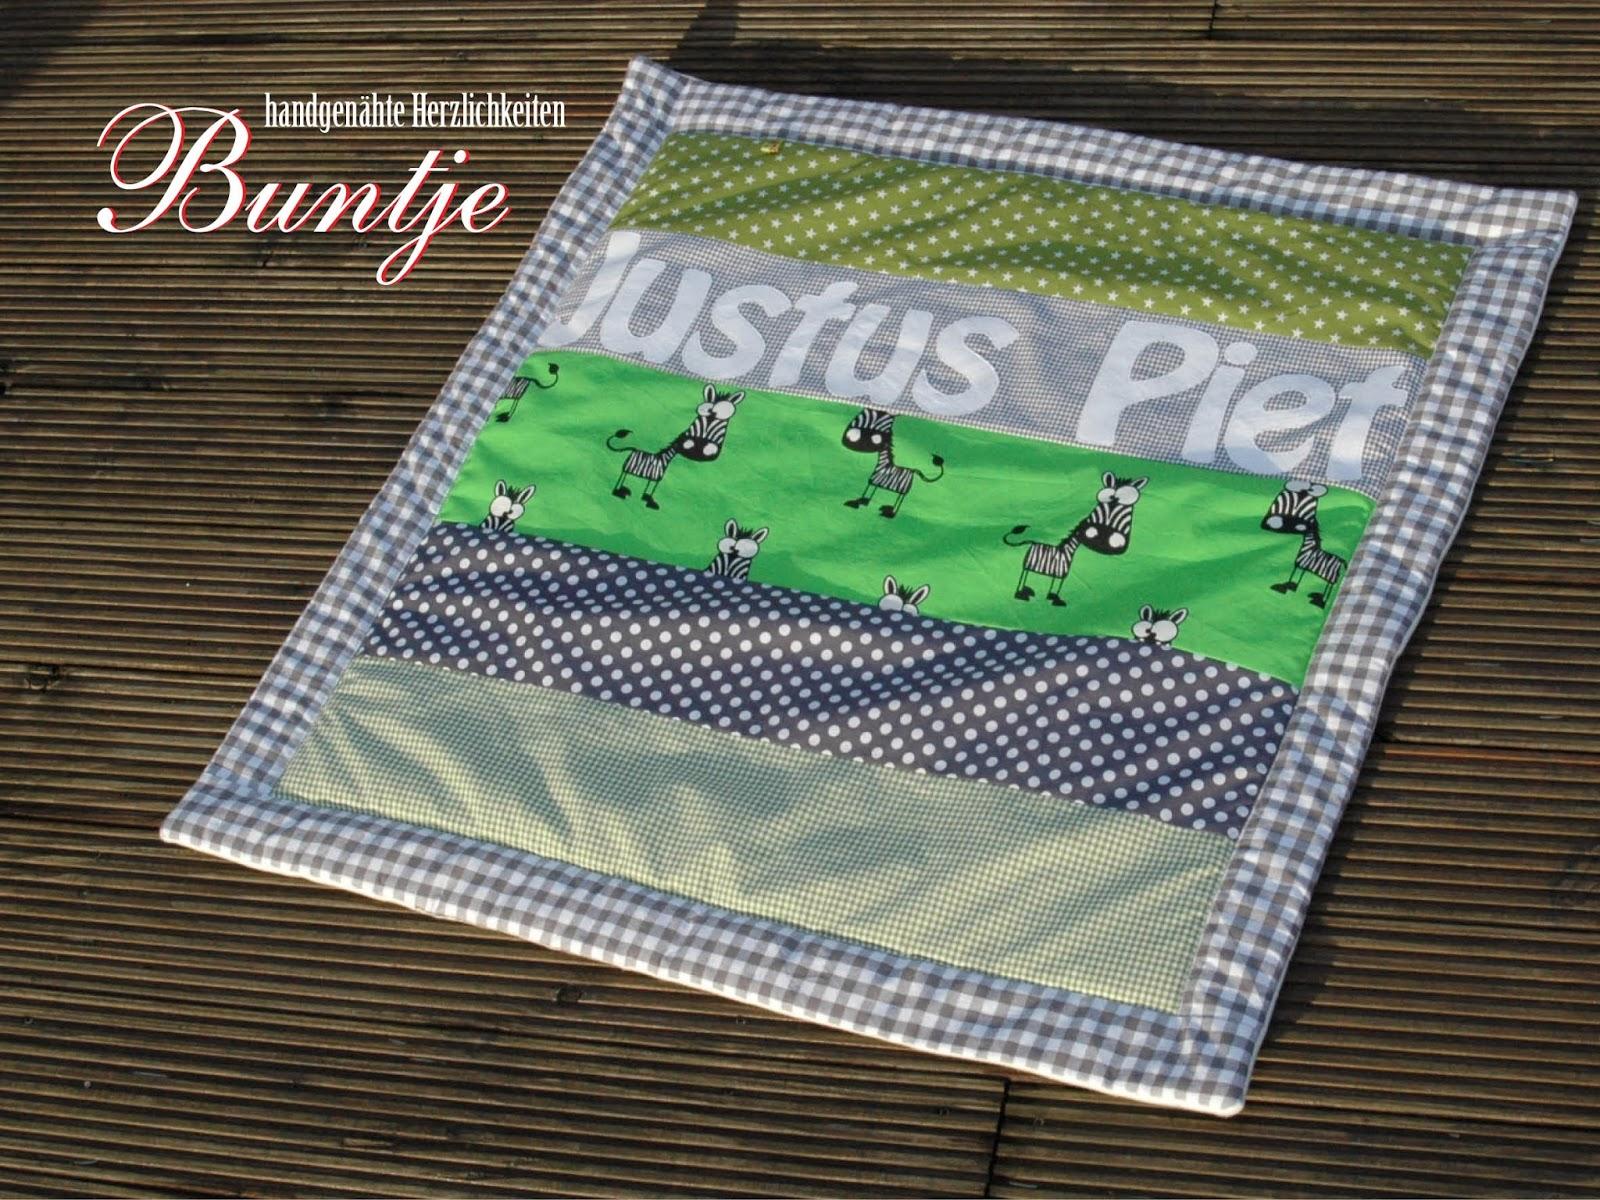 Krabbdeldecke Babydecke Decke Baby Geschenk Geburt Taufe Name Baumwolle Justus Piet Fleece handmade nähen Buntje Junge grün grau Zebra Dschungel